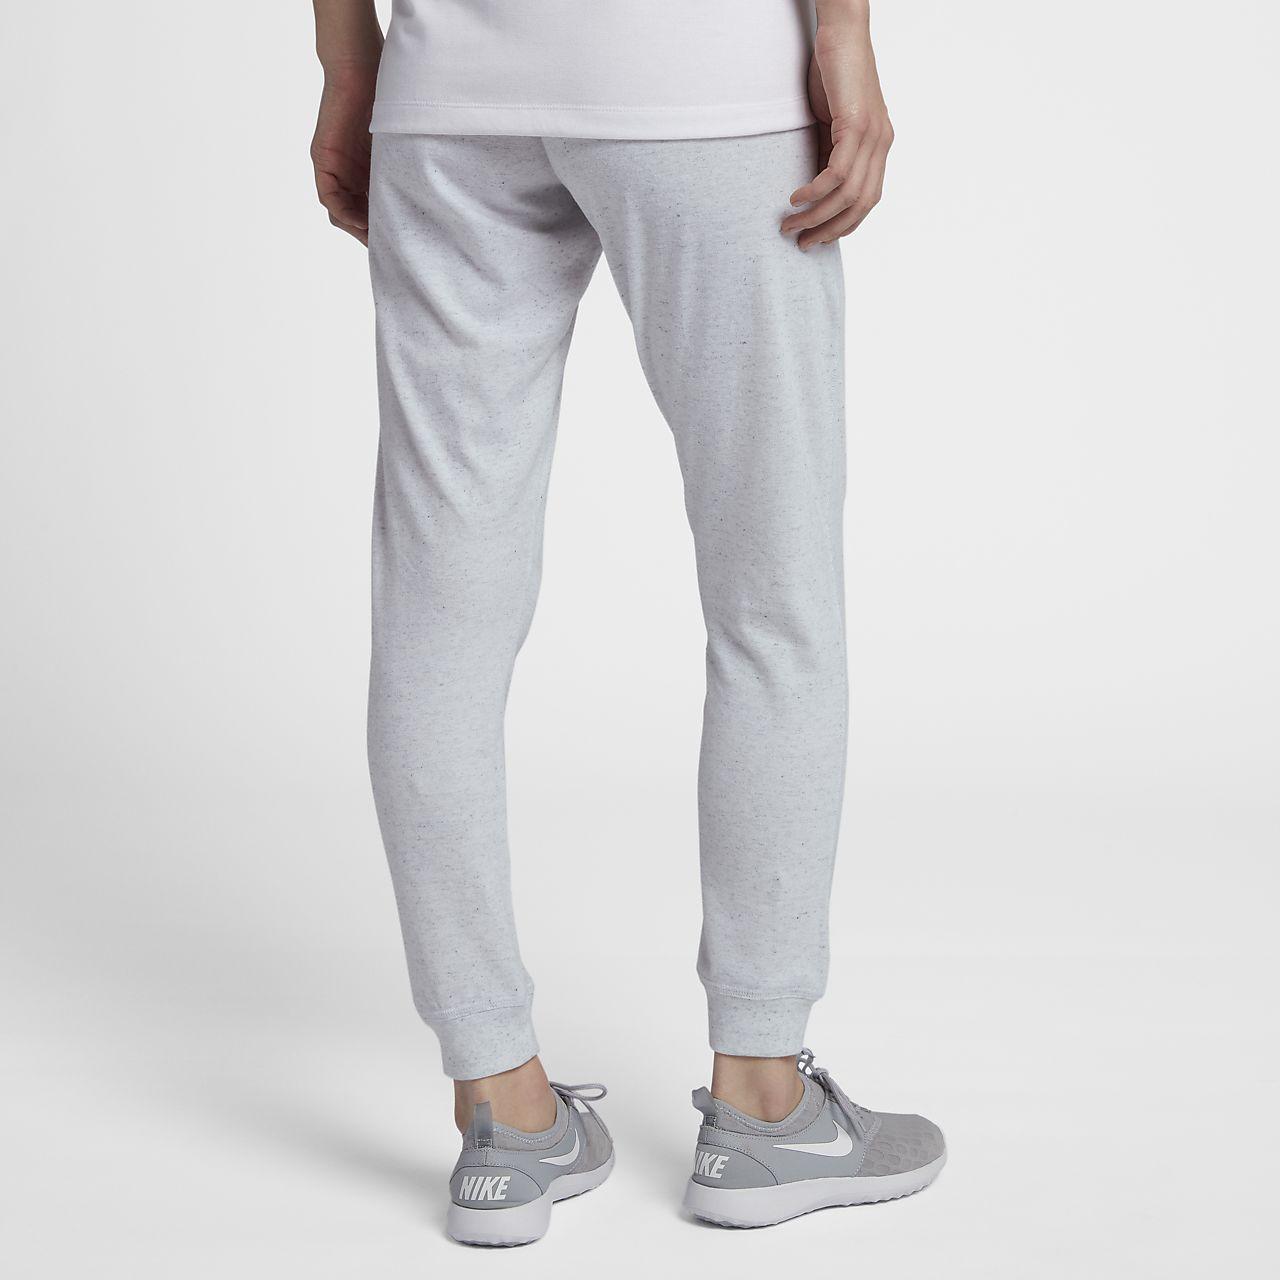 a07fc4114ff9 Nike Sportswear Gym Vintage Women s Trousers. Nike.com NO